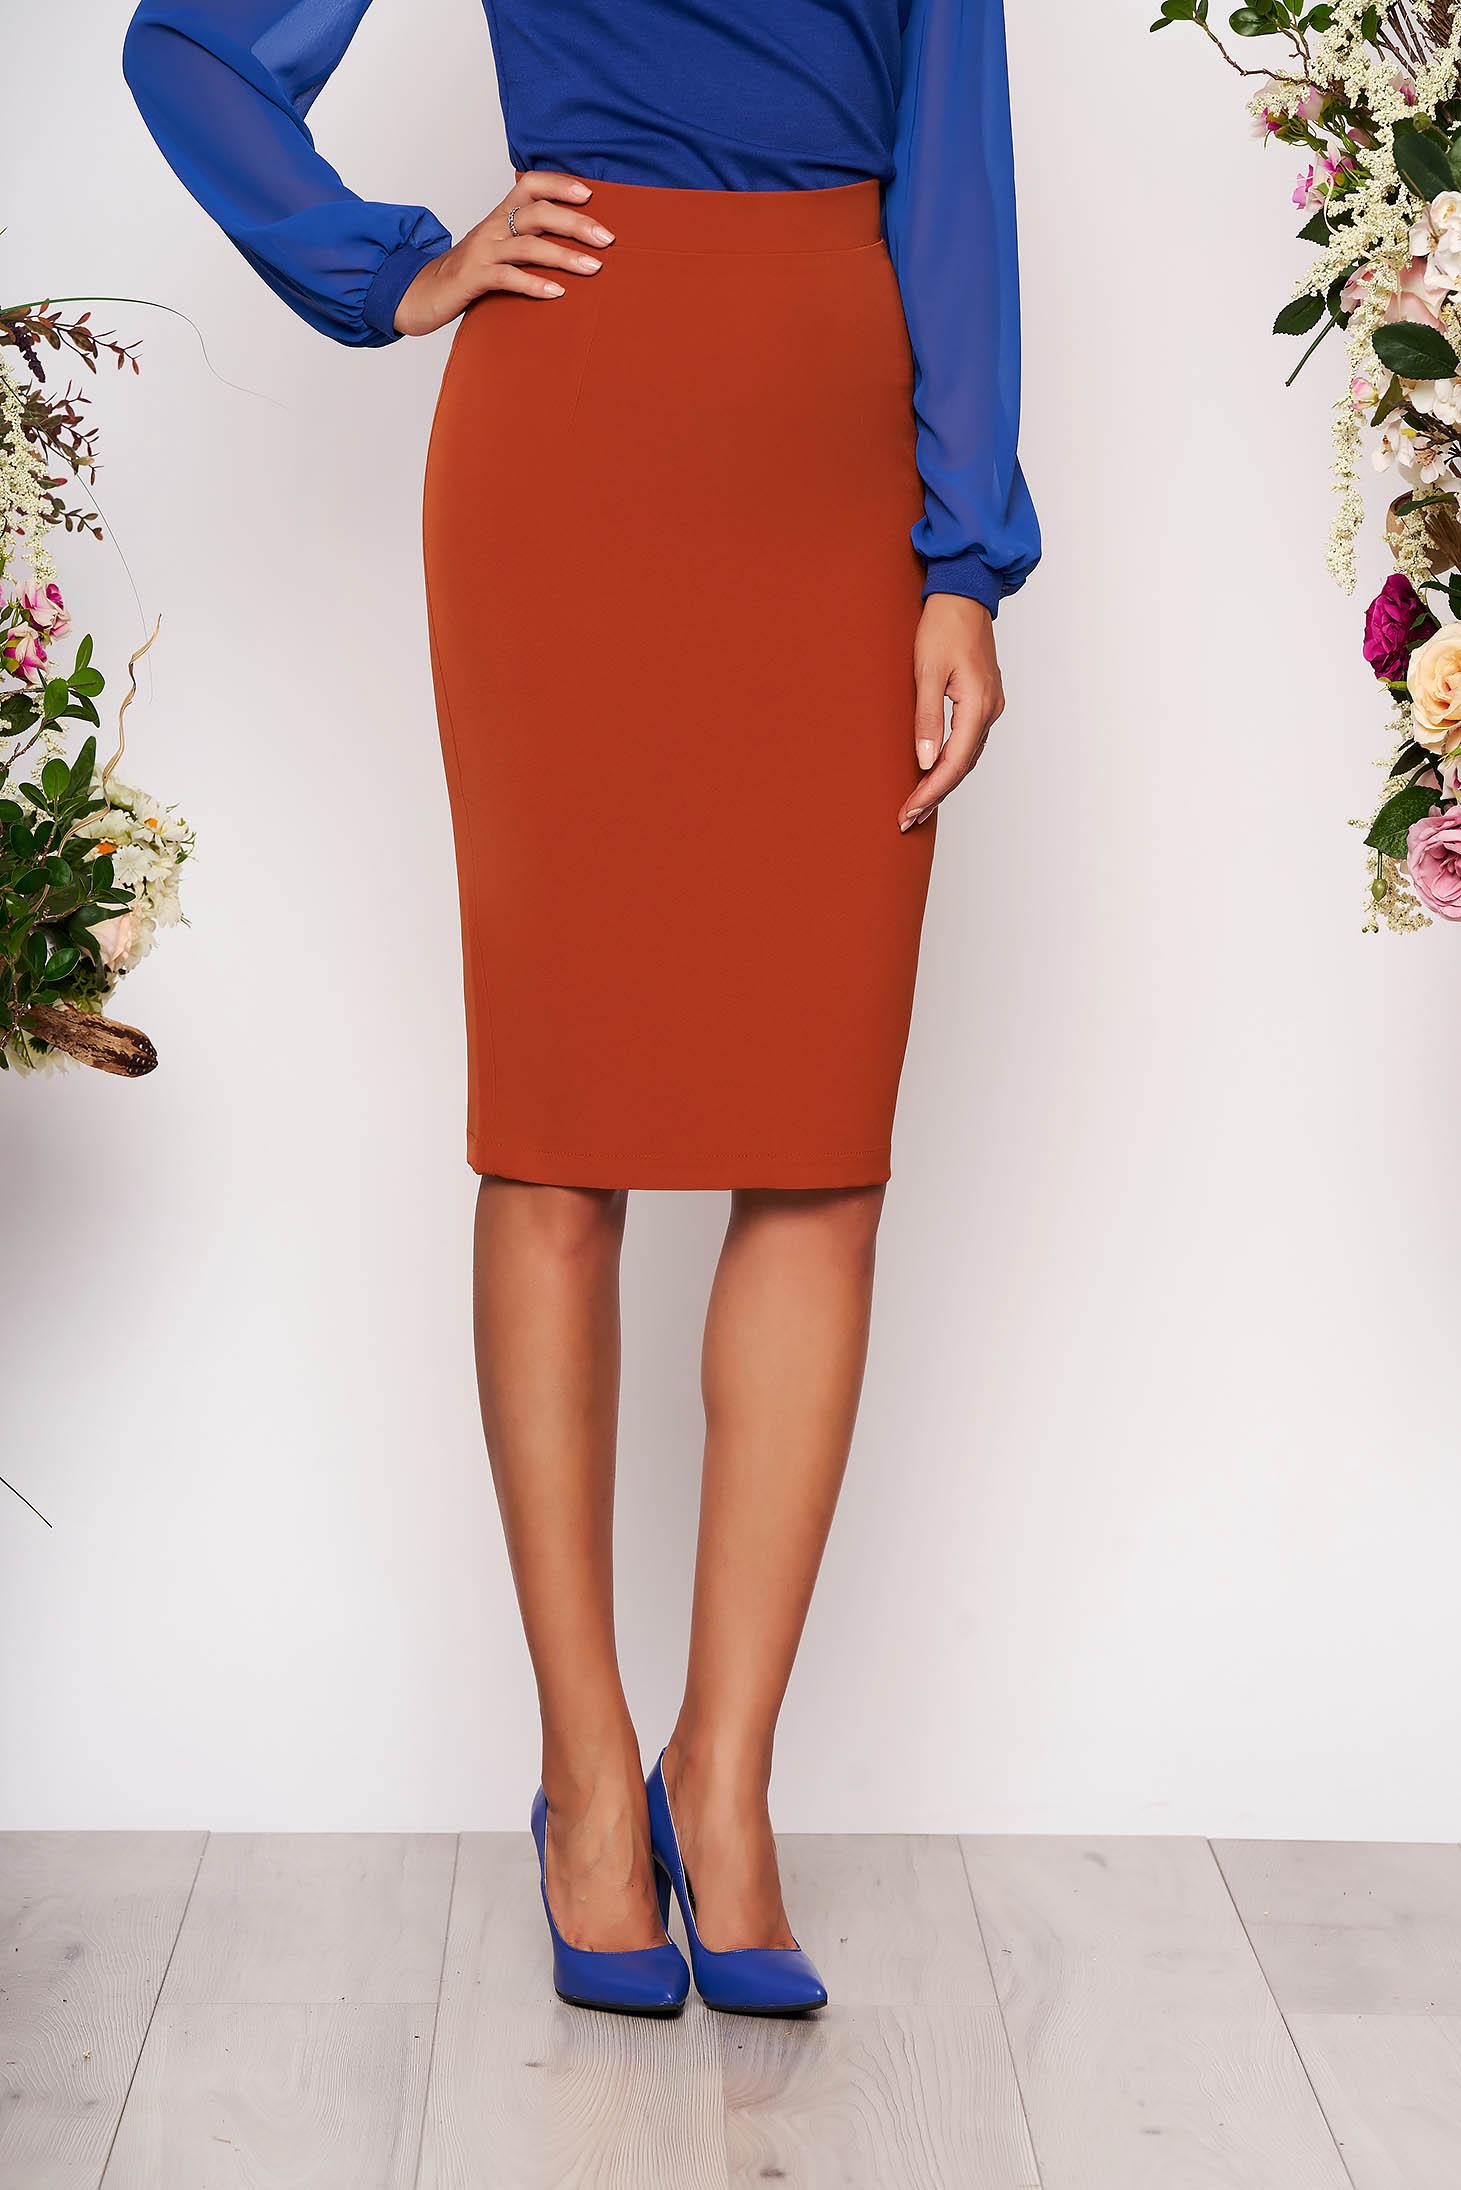 StarShinerS bricky high waisted office pencil skirt slightly elastic fabric